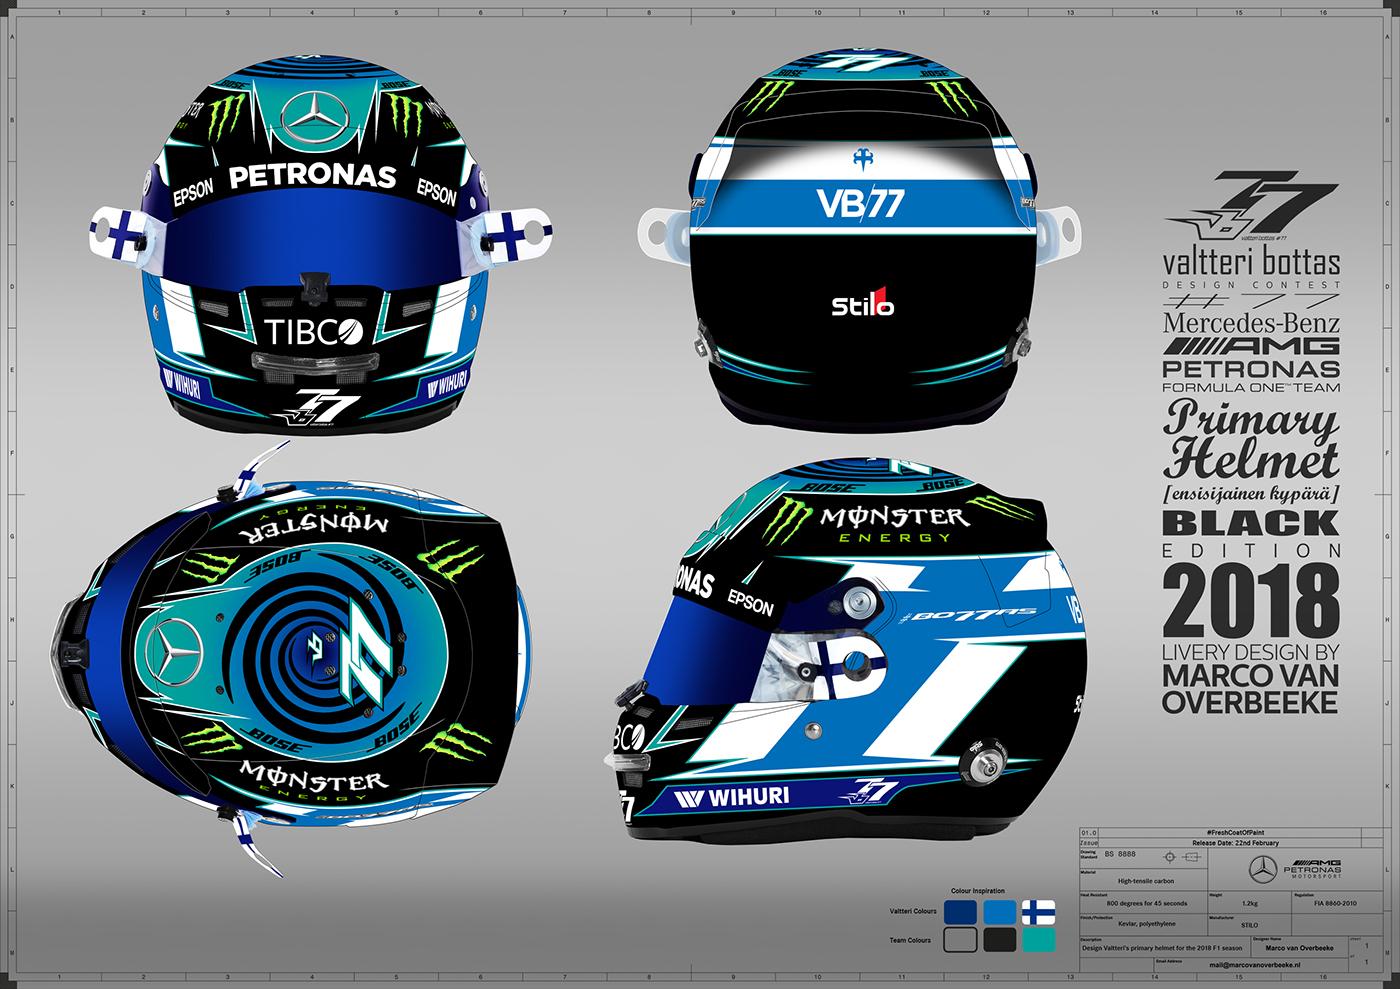 Valtteri Bottas Helmet Design Contest 2018 on Behance